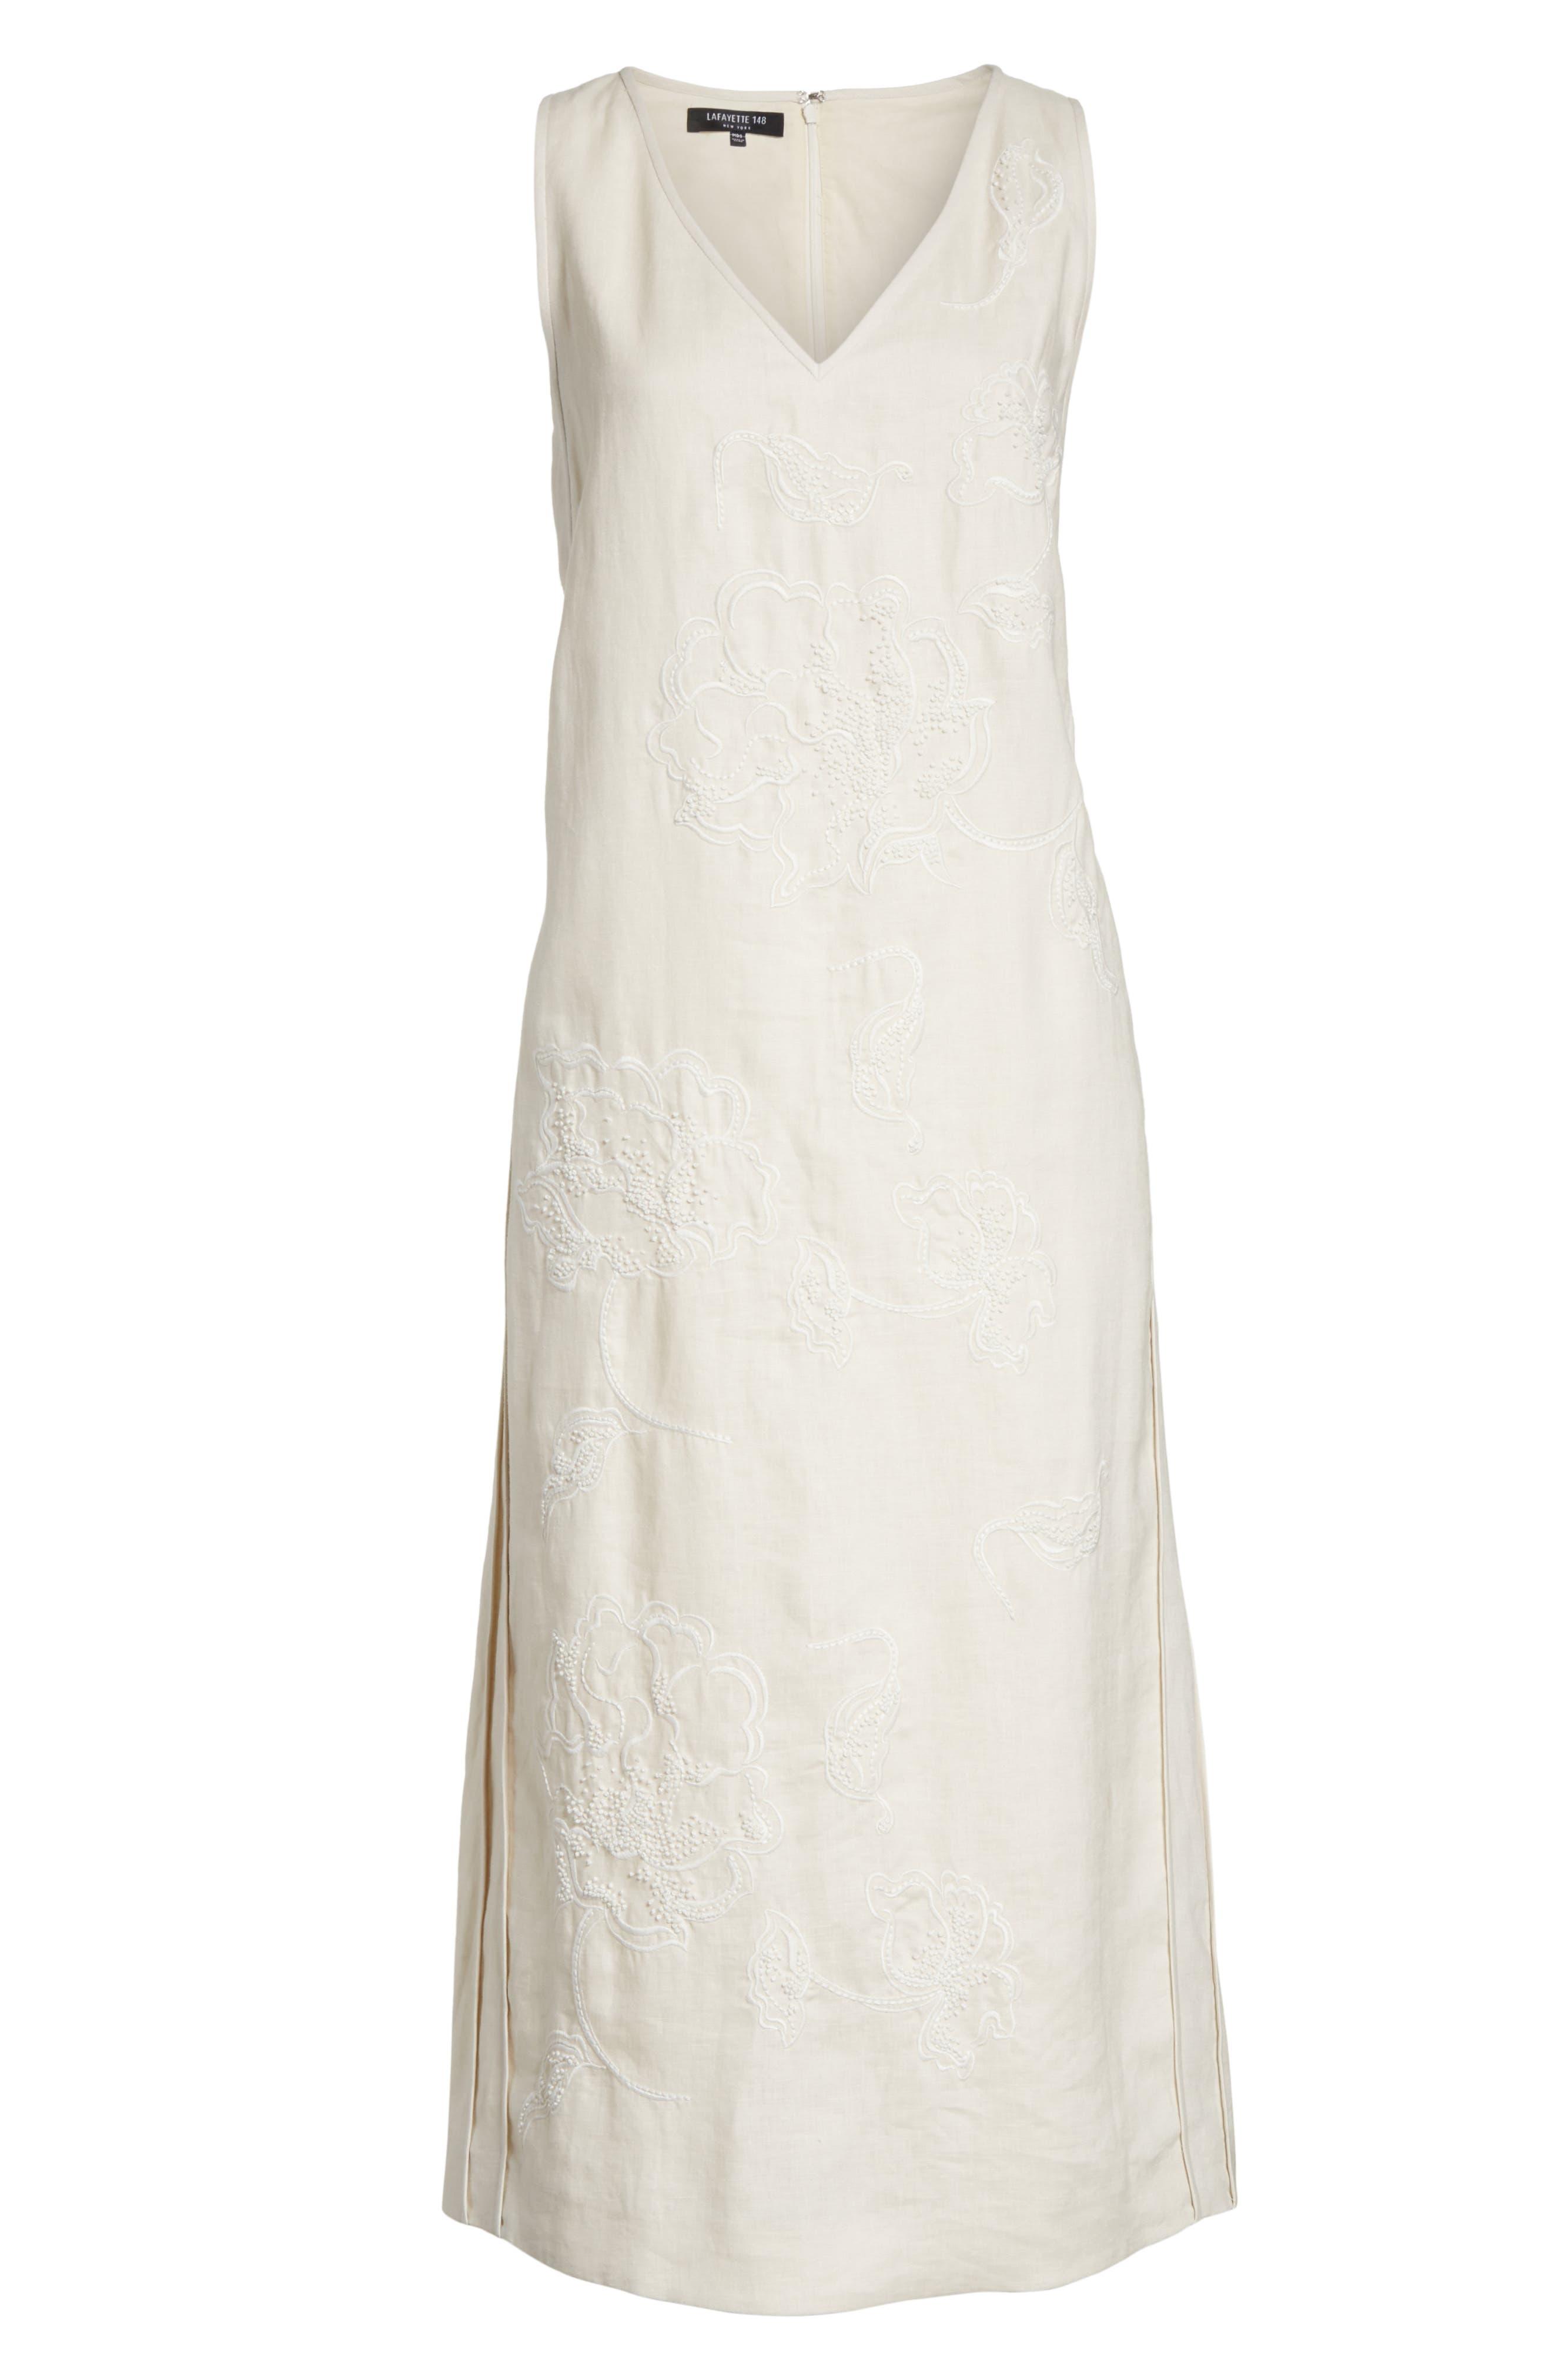 Duncan Embroidered Linen Dress,                             Alternate thumbnail 6, color,                             252